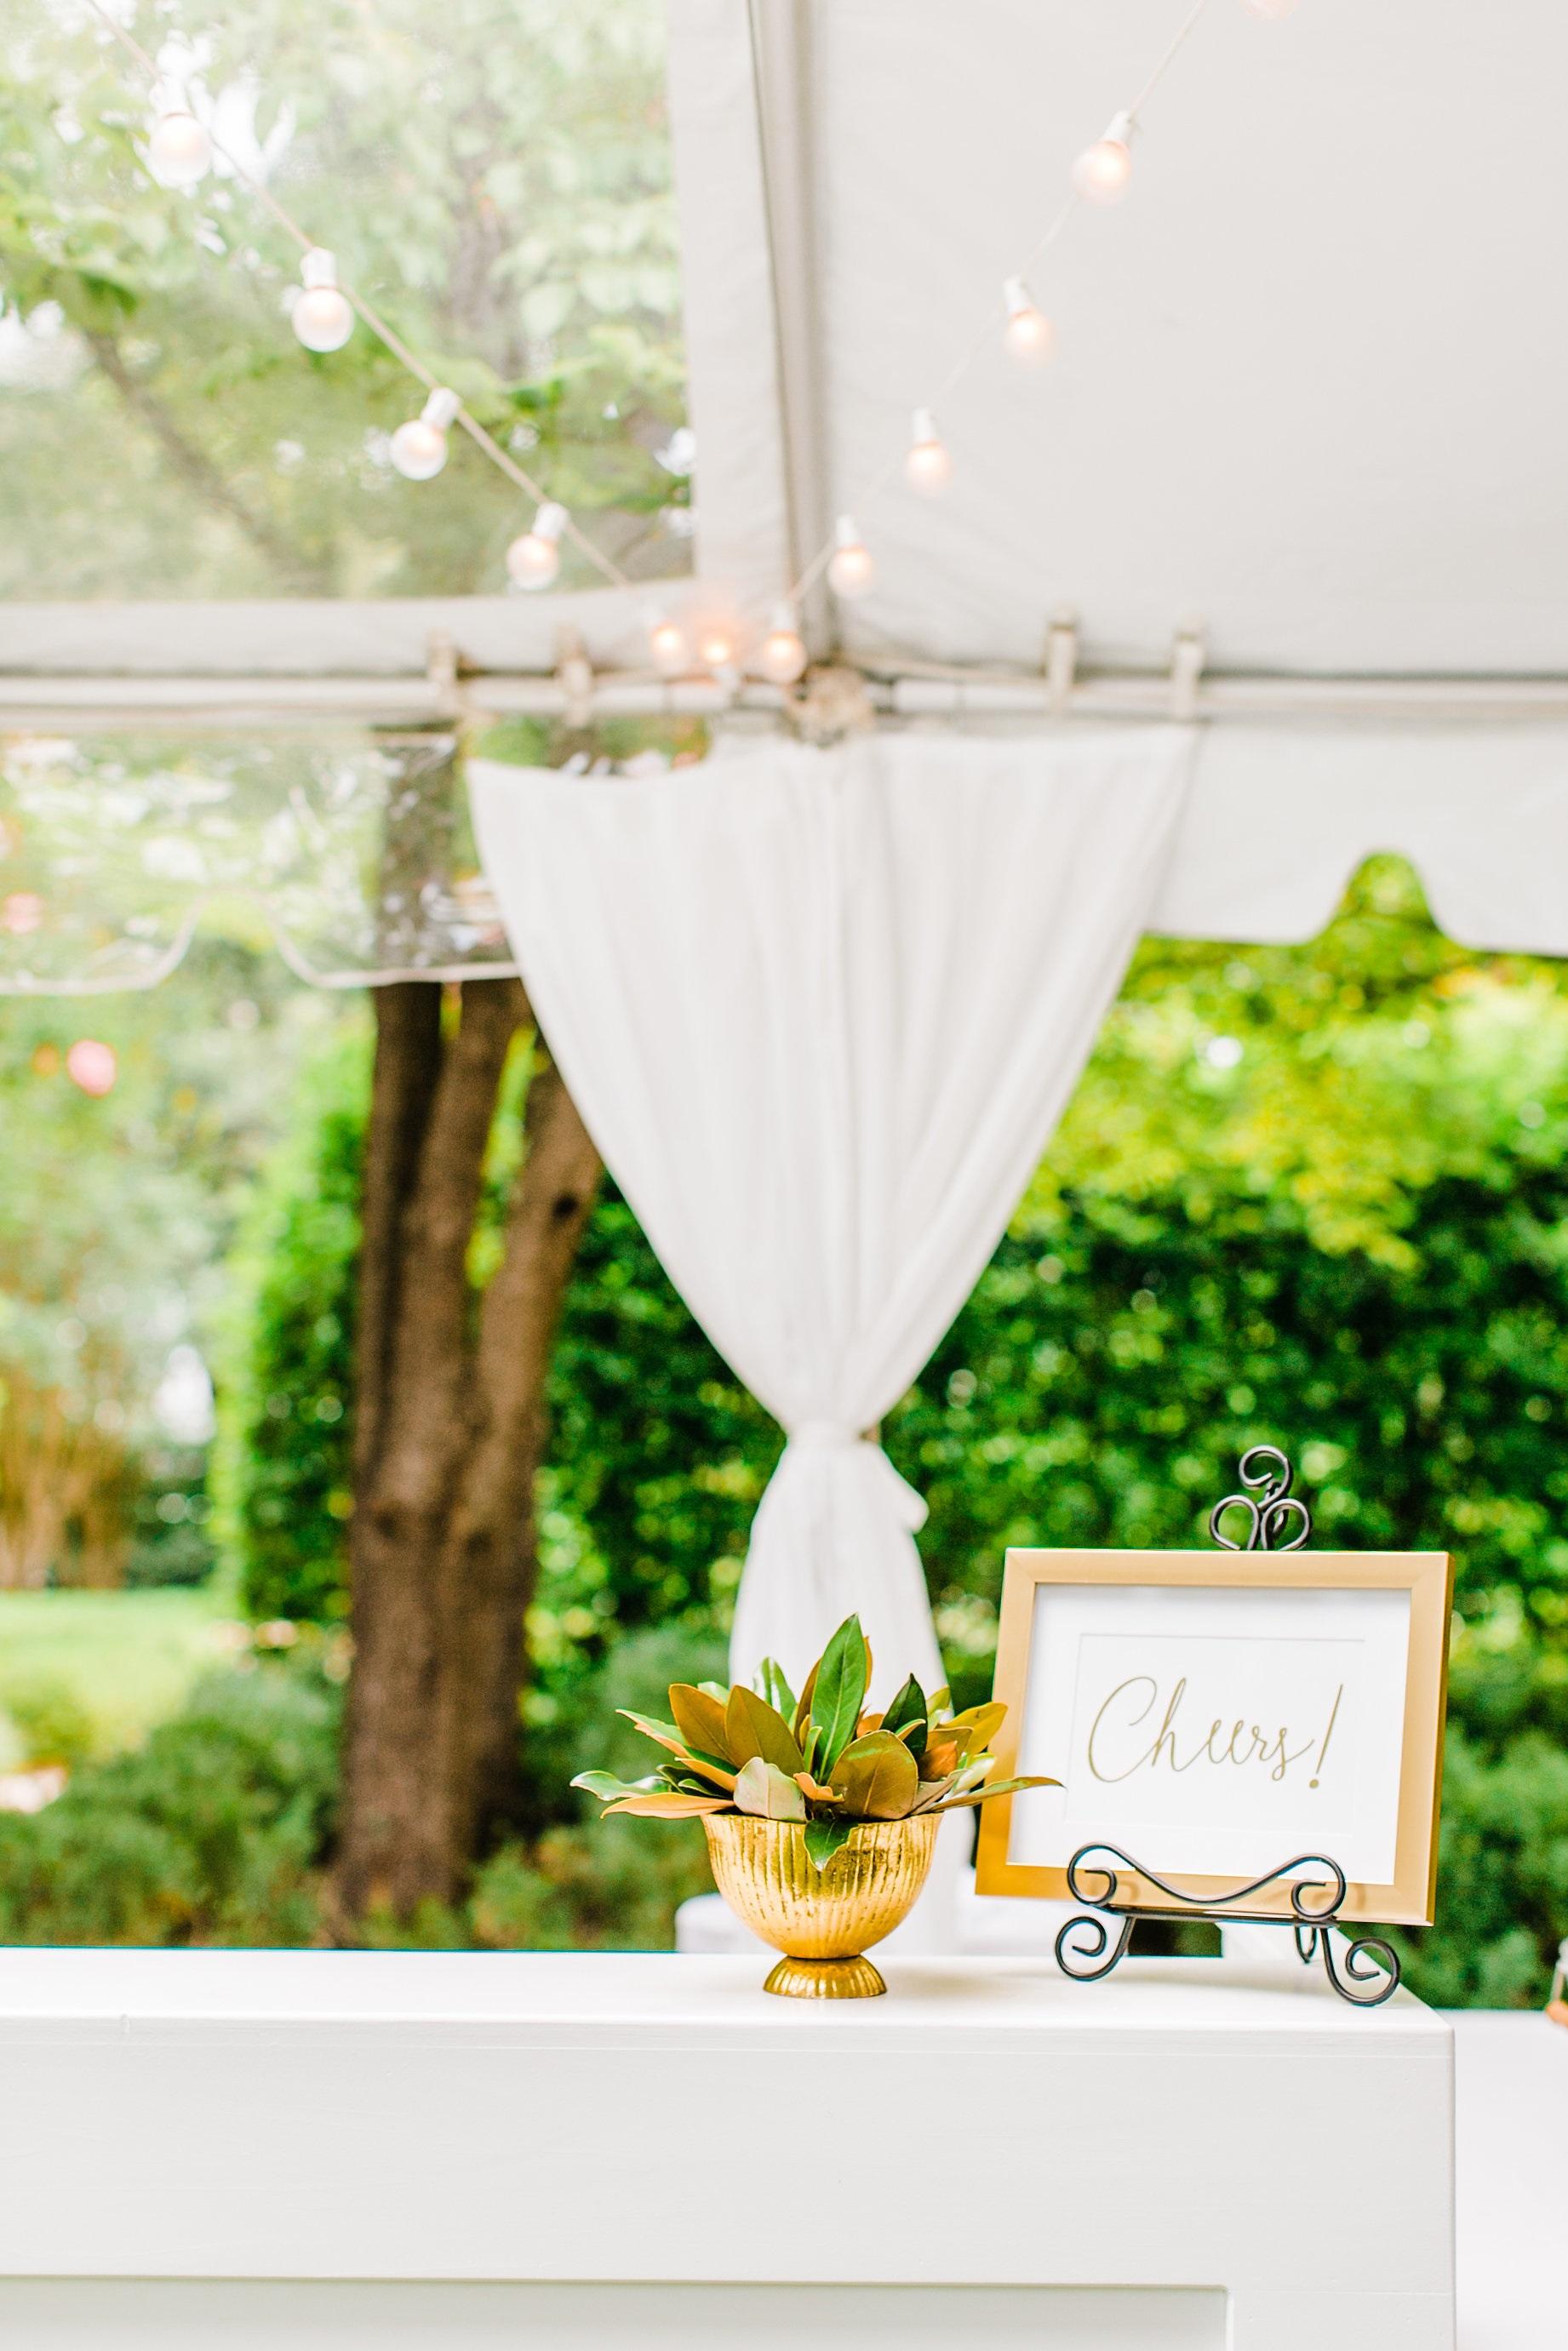 robertmillshousewedding-285.jpg